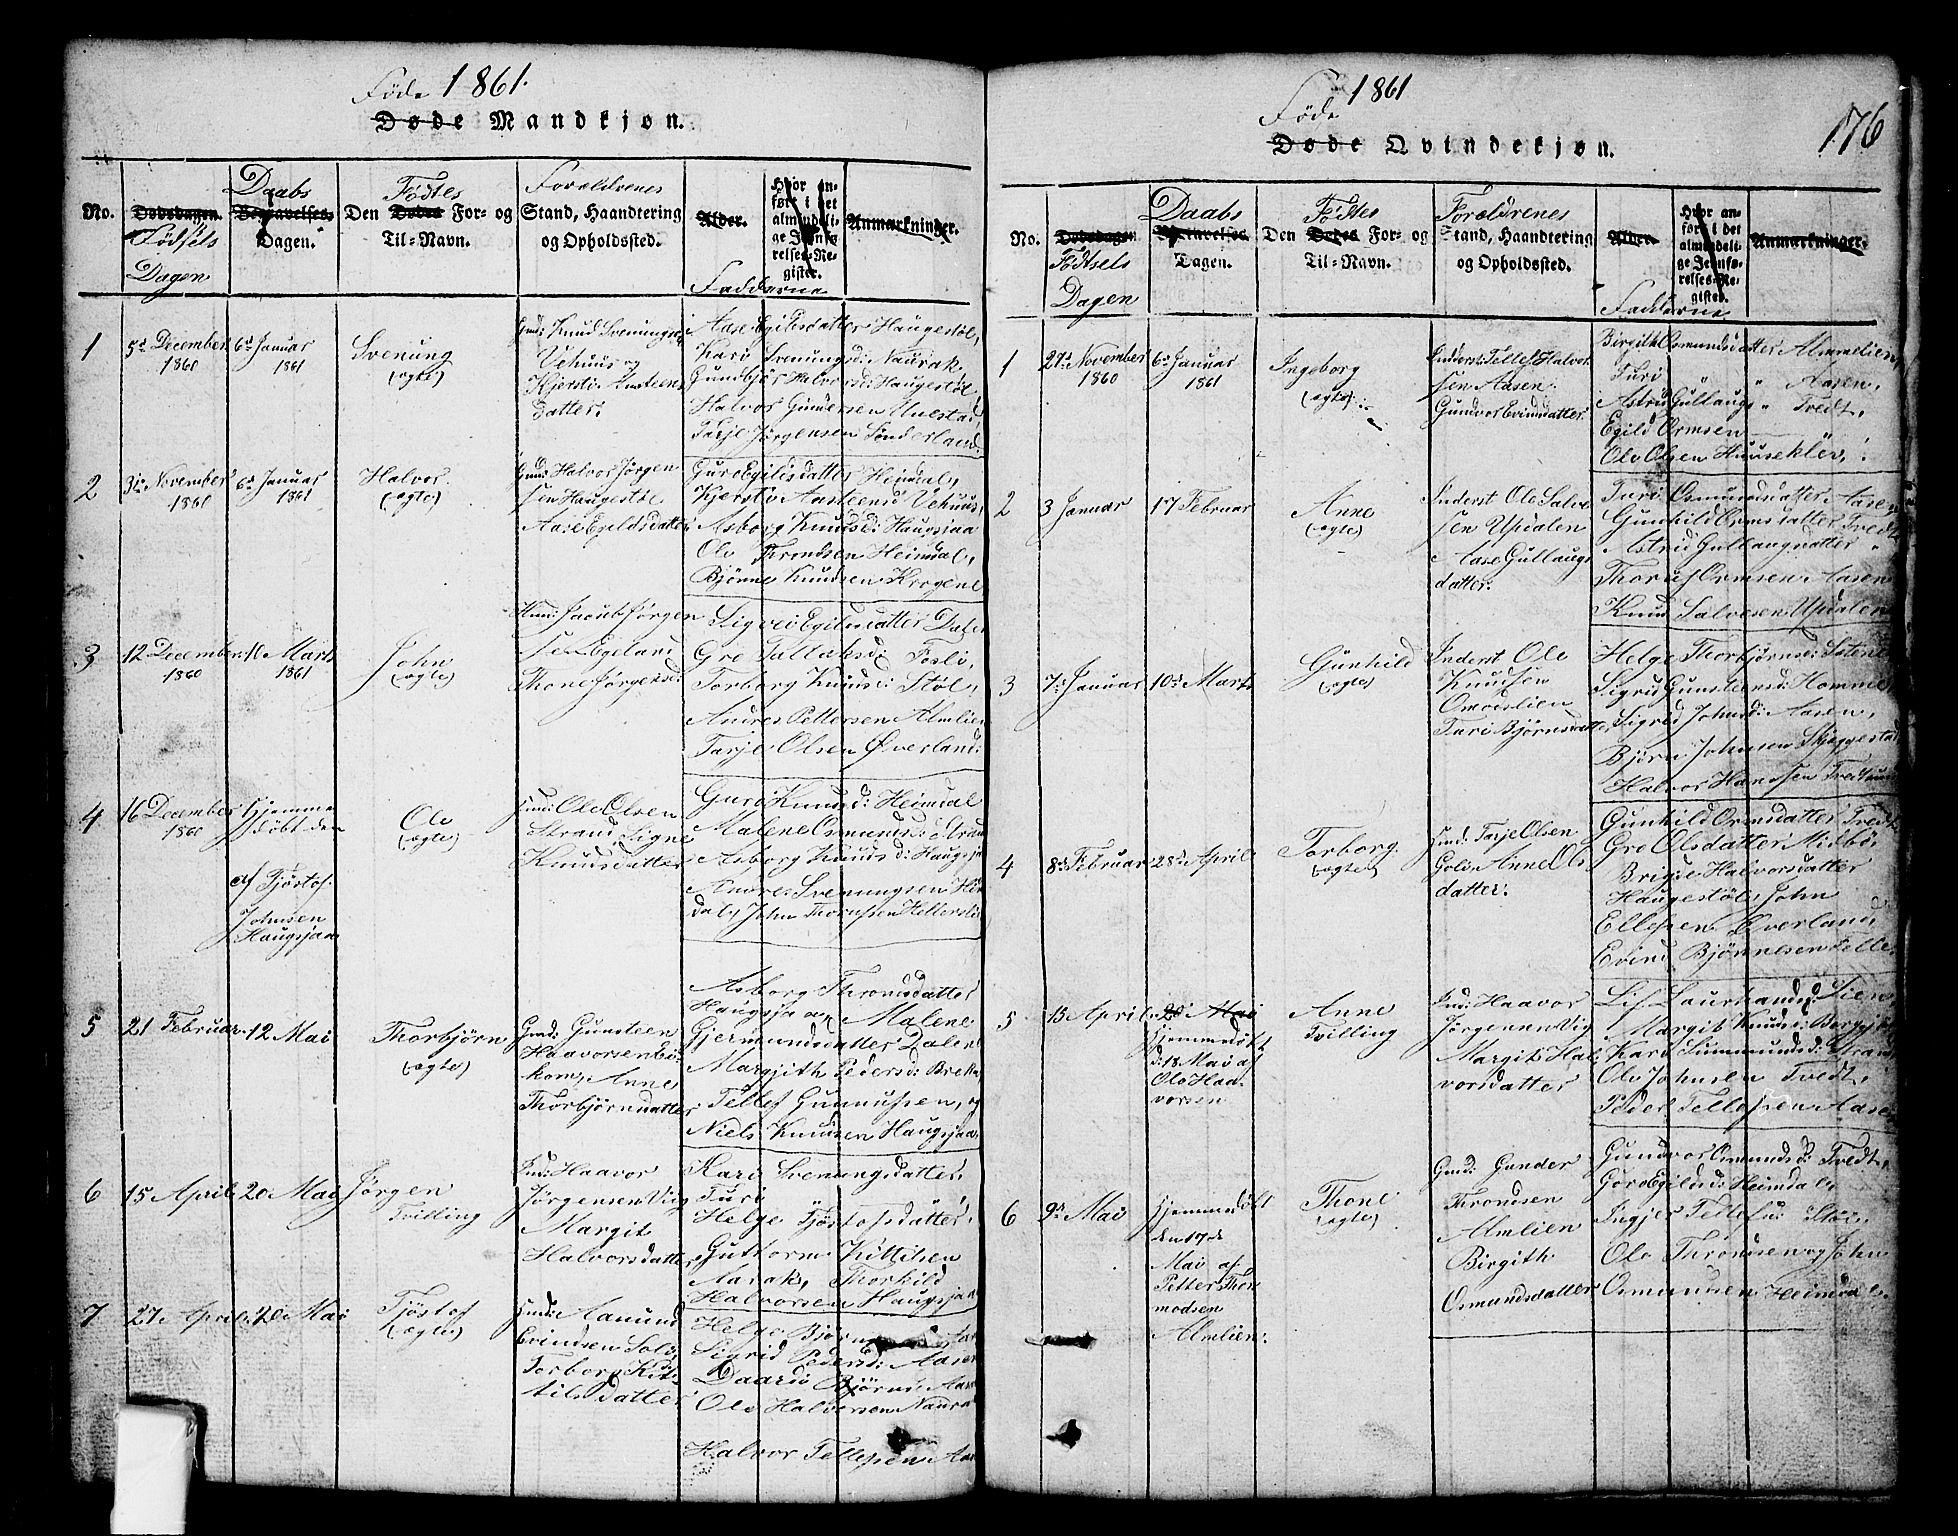 SAKO, Nissedal kirkebøker, G/Gb/L0001: Klokkerbok nr. II 1, 1814-1862, s. 176